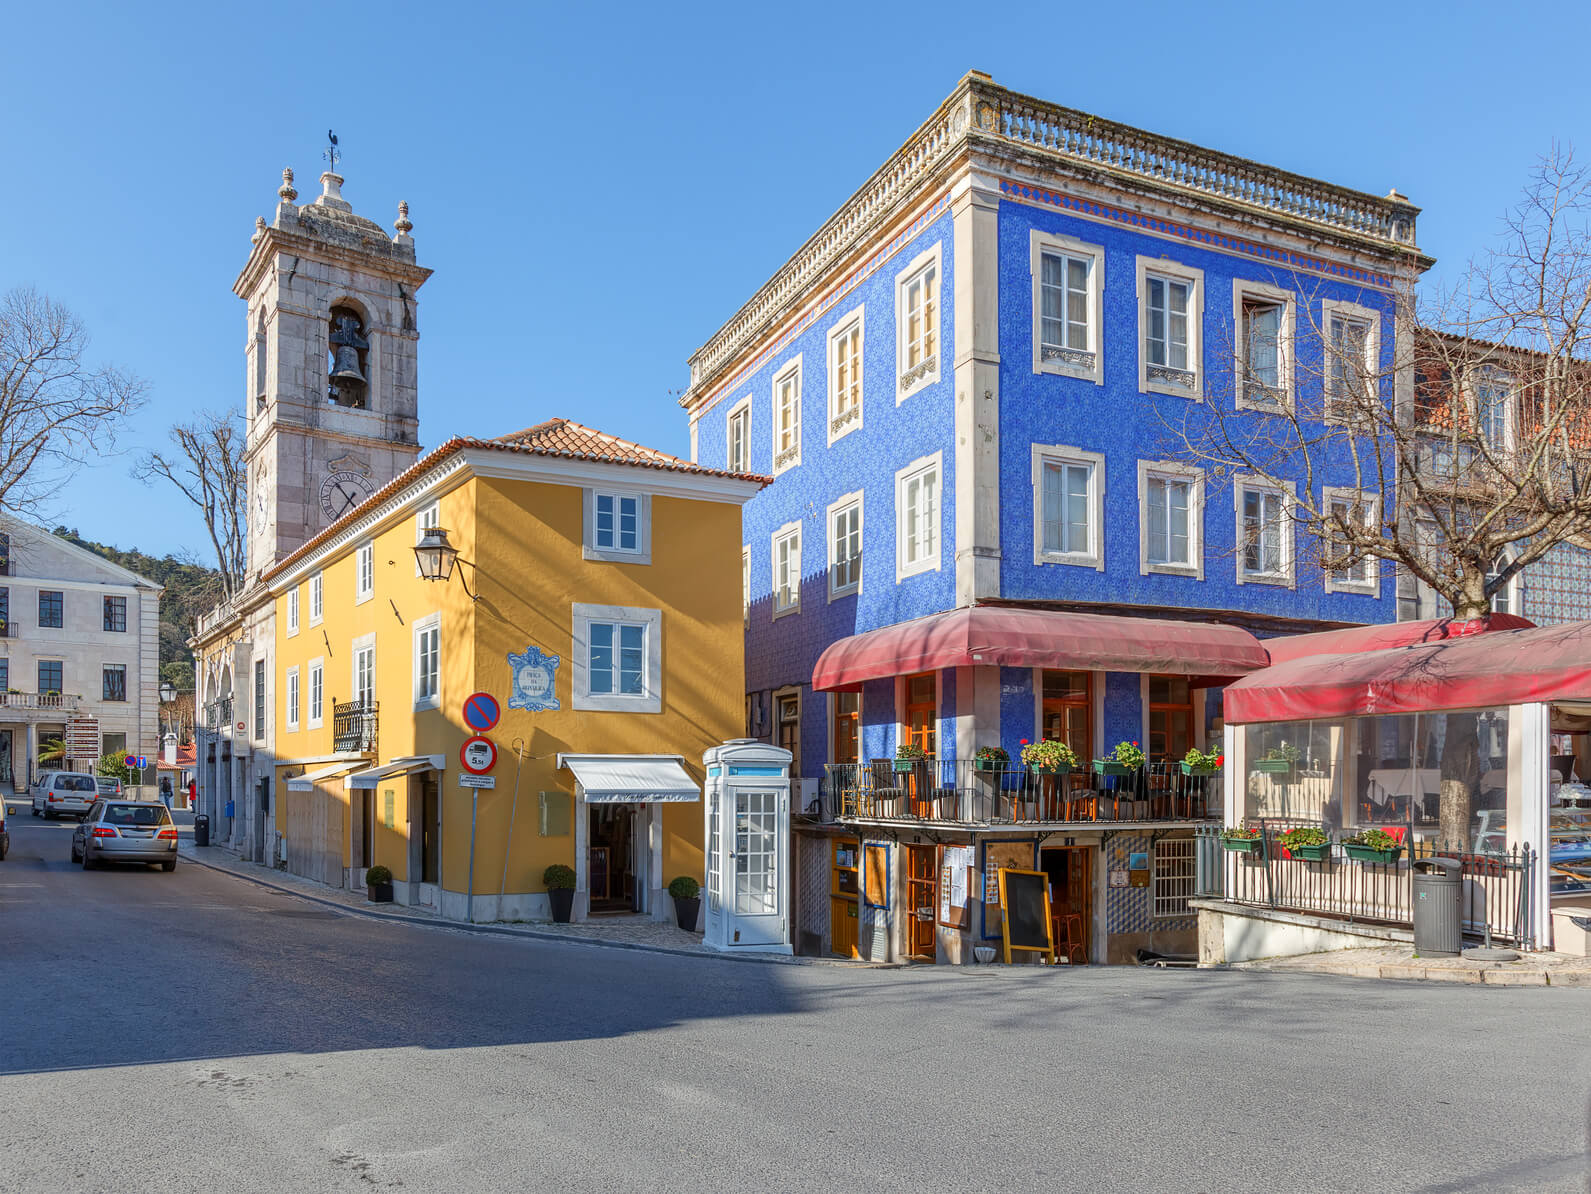 Tour to Sintra & Cascais